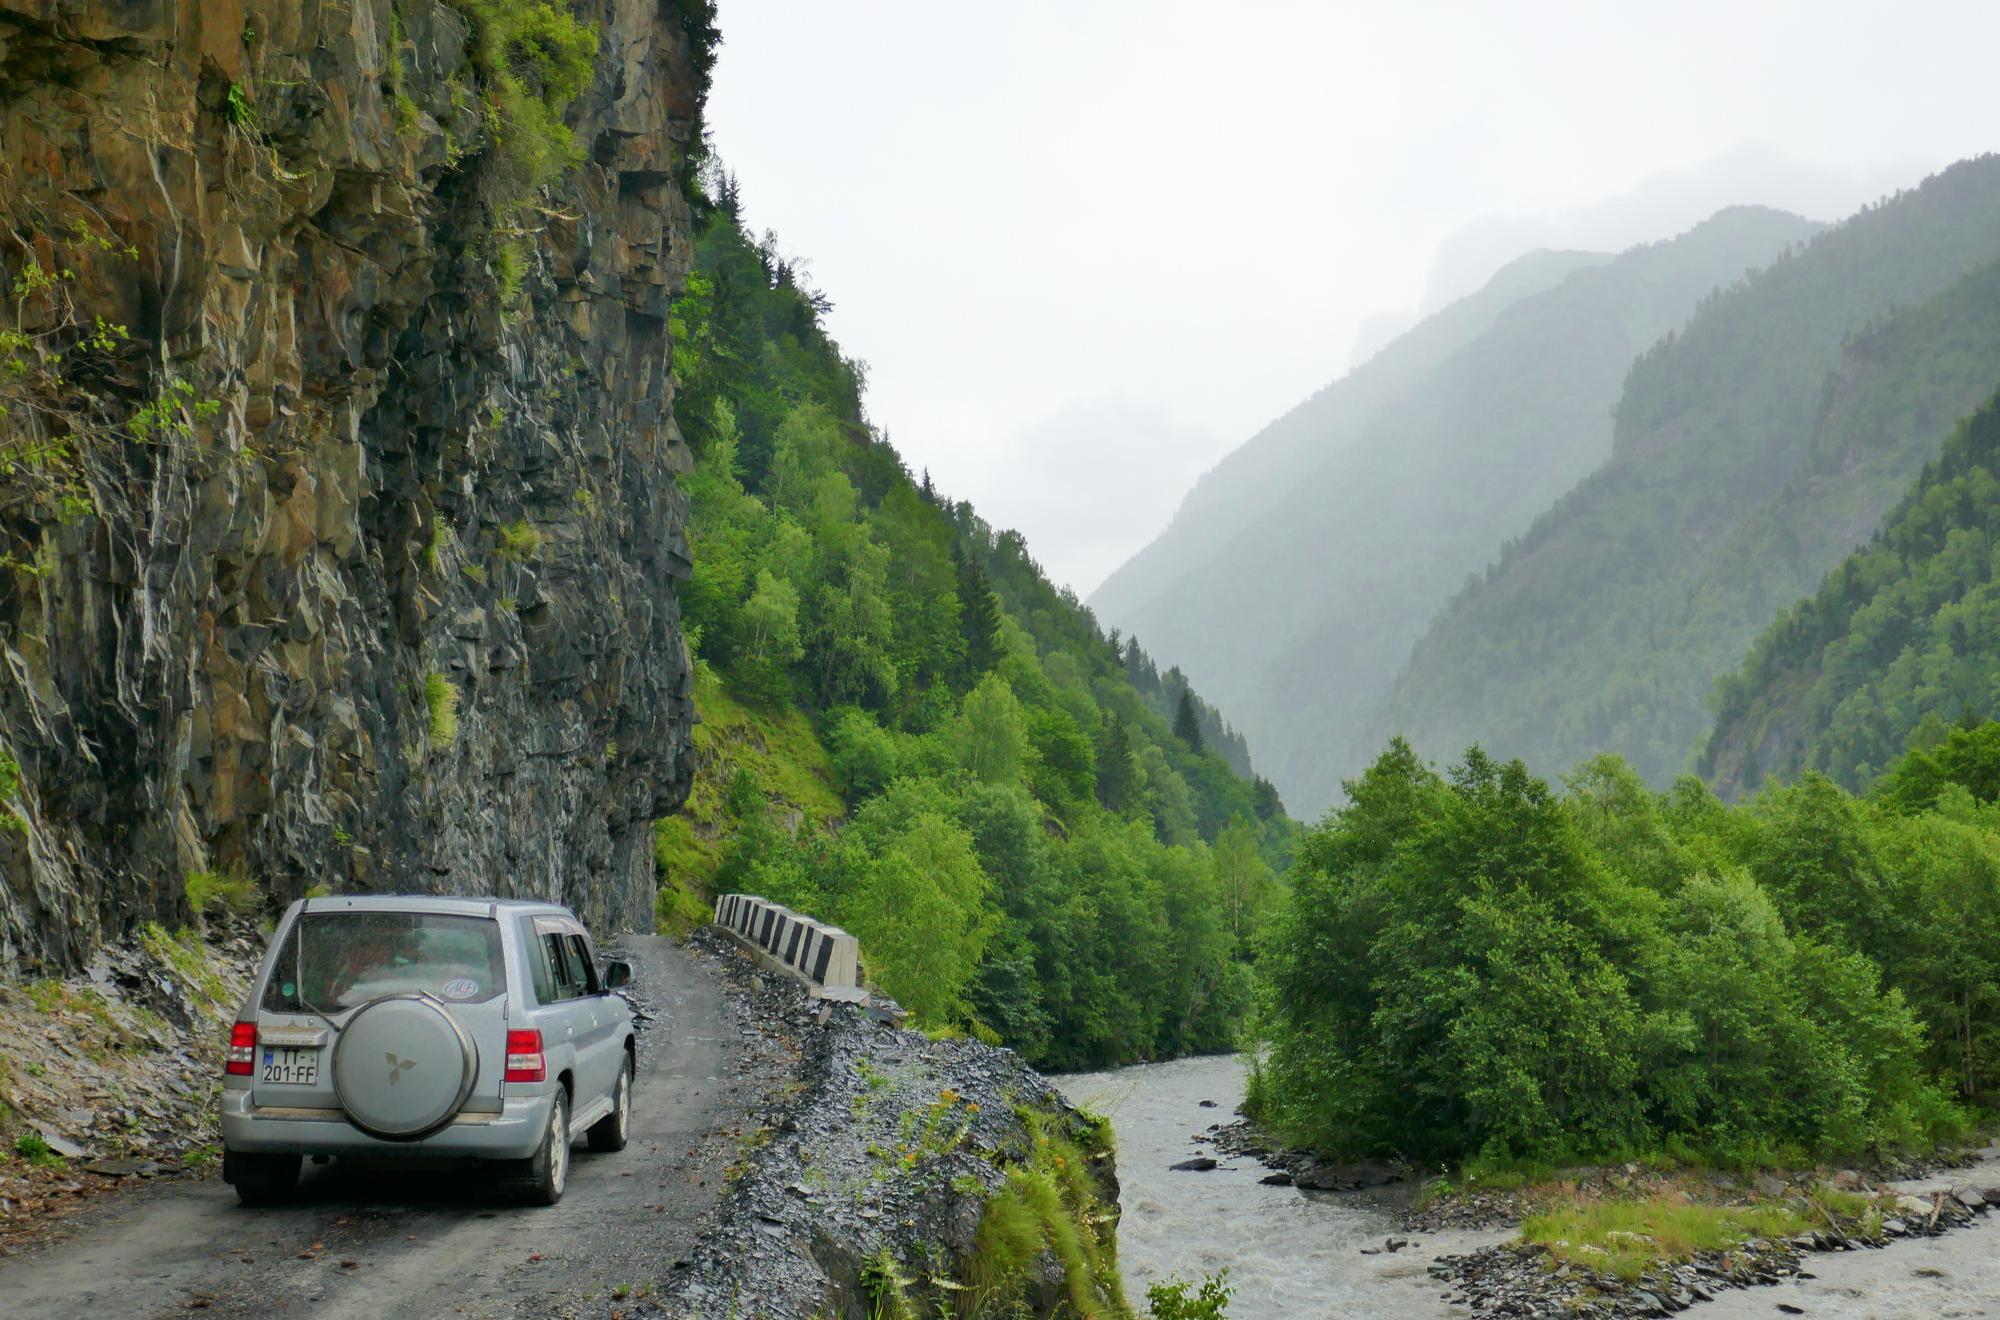 Áreas de Racha-Lechkhumi y Kvemo Svaneti: Lentekhi